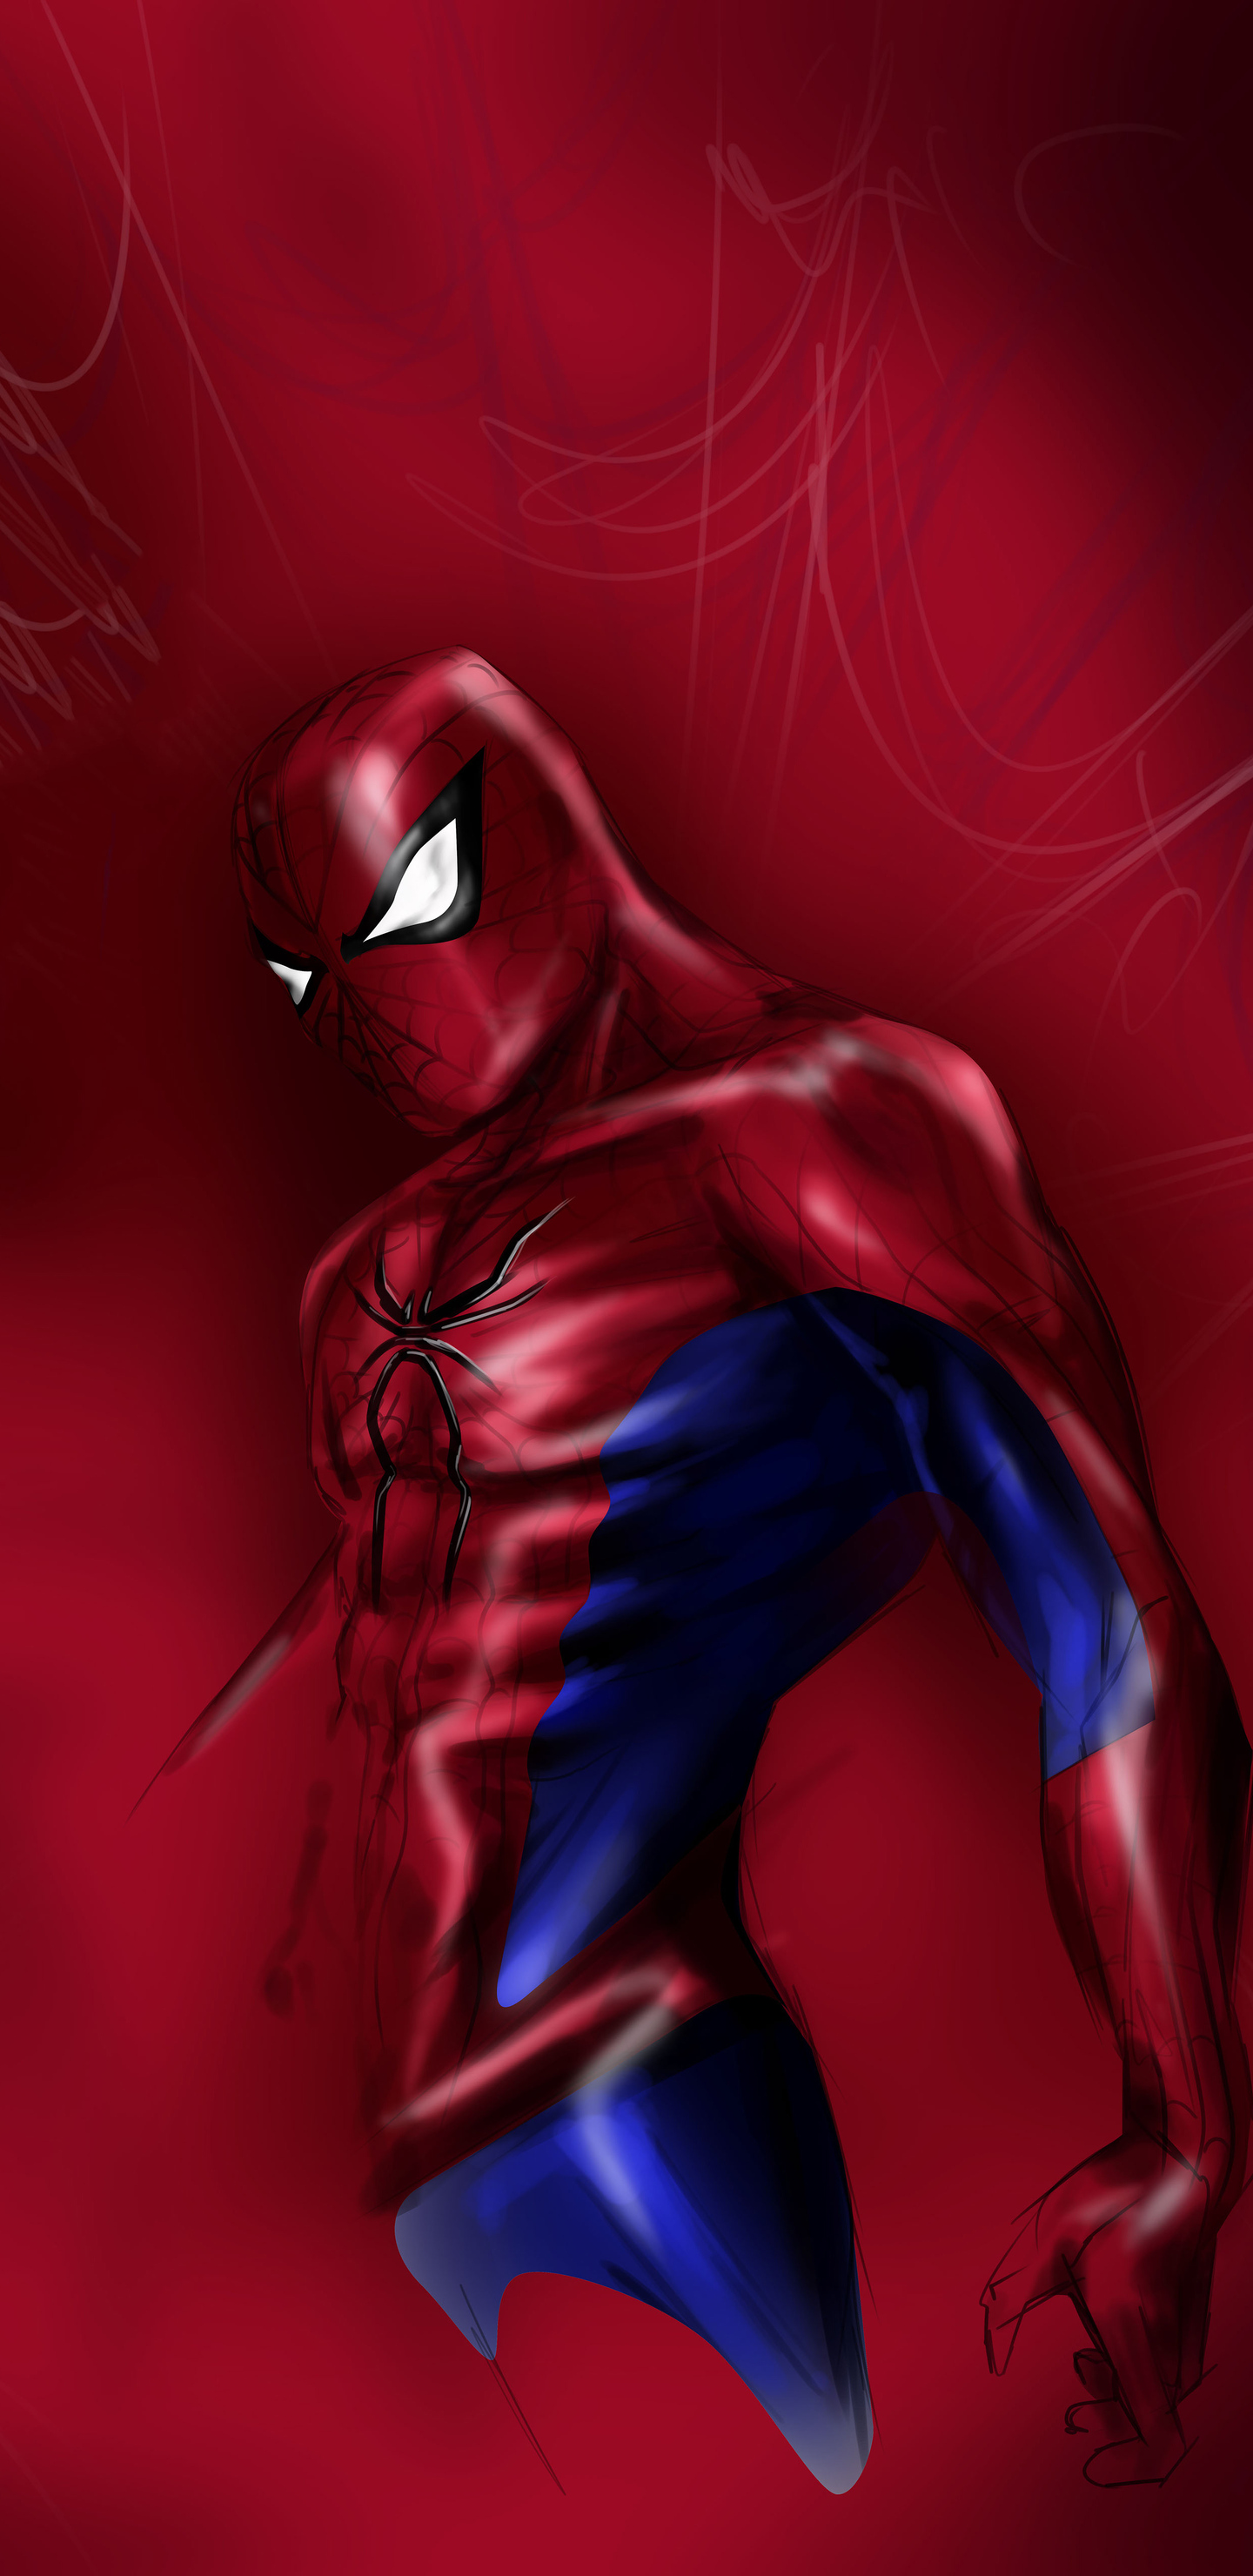 spiderman-comic-art-4k-ha.jpg